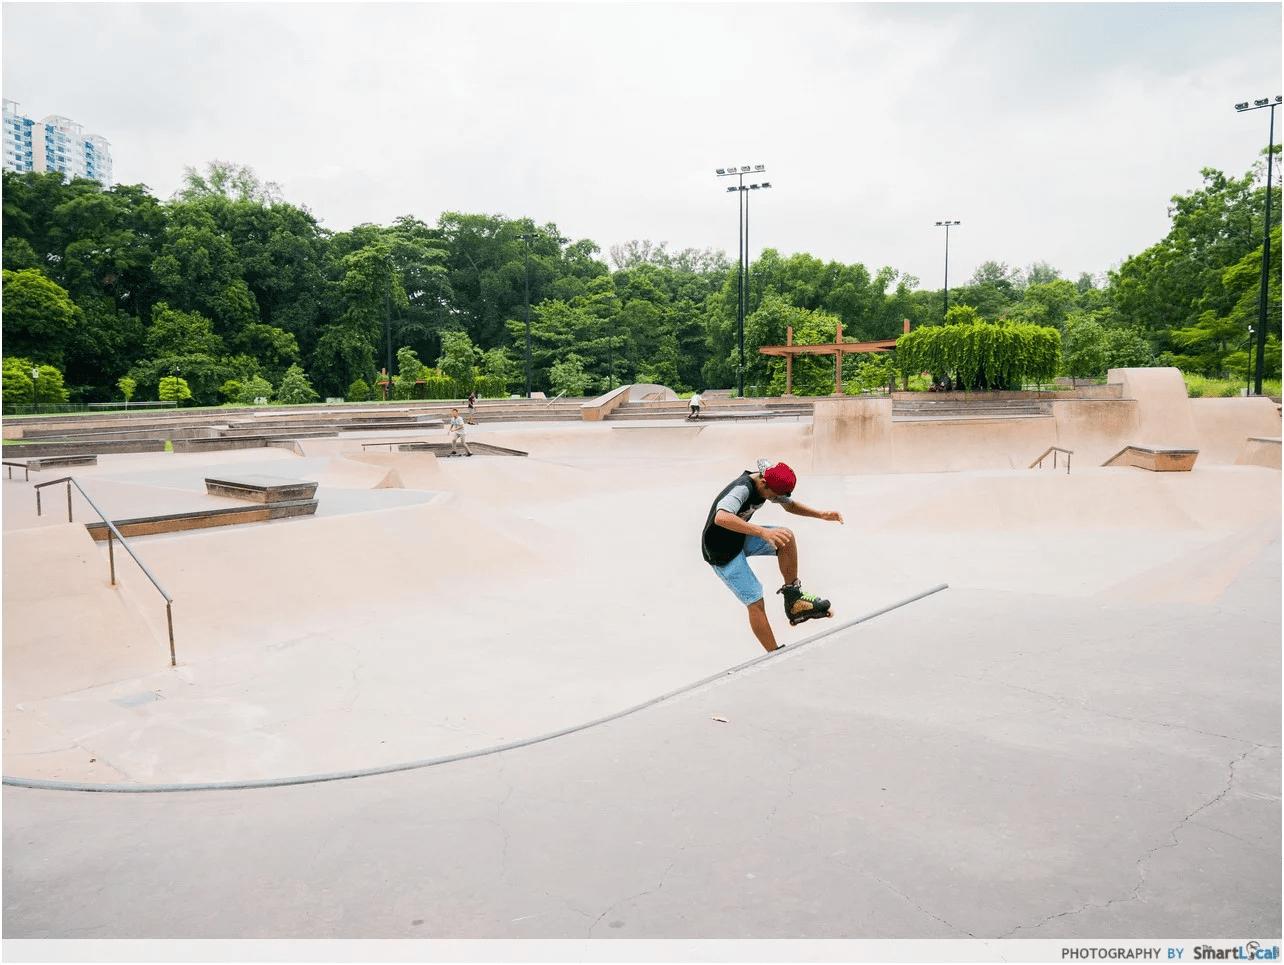 East Coast's Xtreme SkatePark